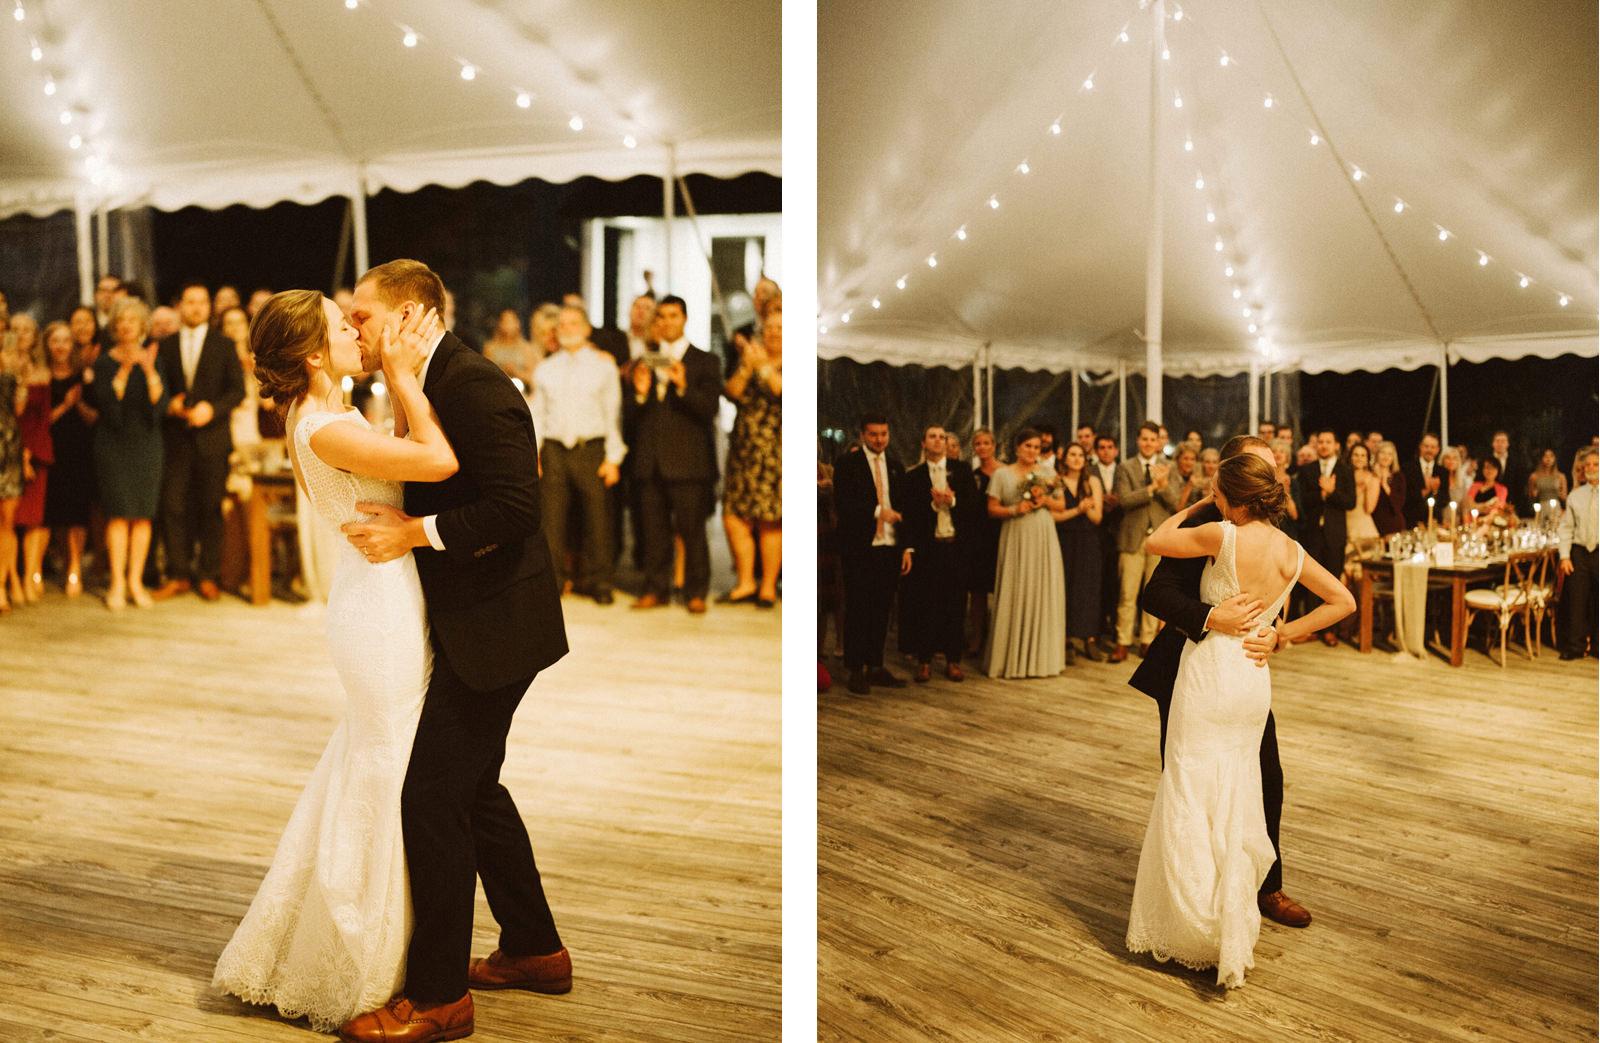 bridgeport-wedding-139 BRIDGEPORT, CONNECTICUT BACKYARD WEDDING